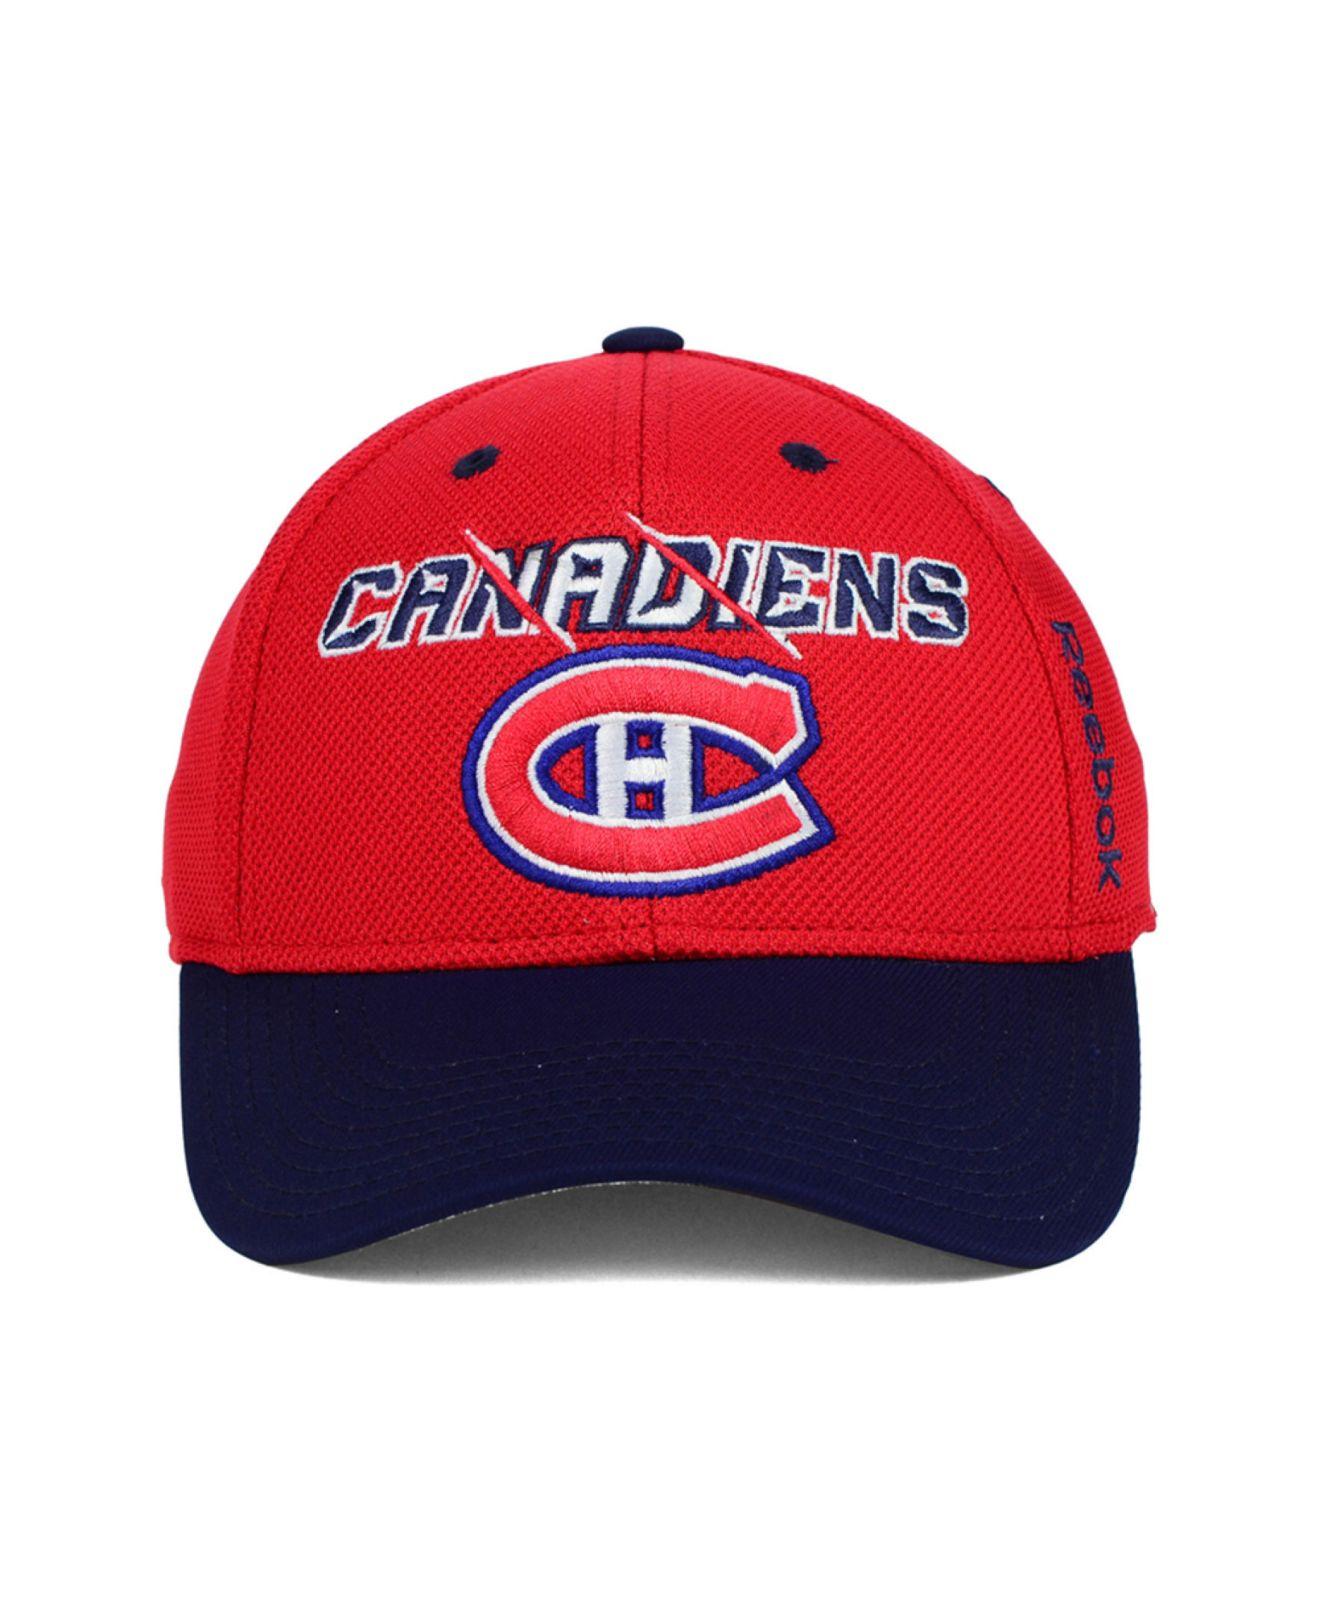 Lyst - Reebok Montreal Canadiens 2nd Season Flex Cap in Red for Men e4064c6b33bf